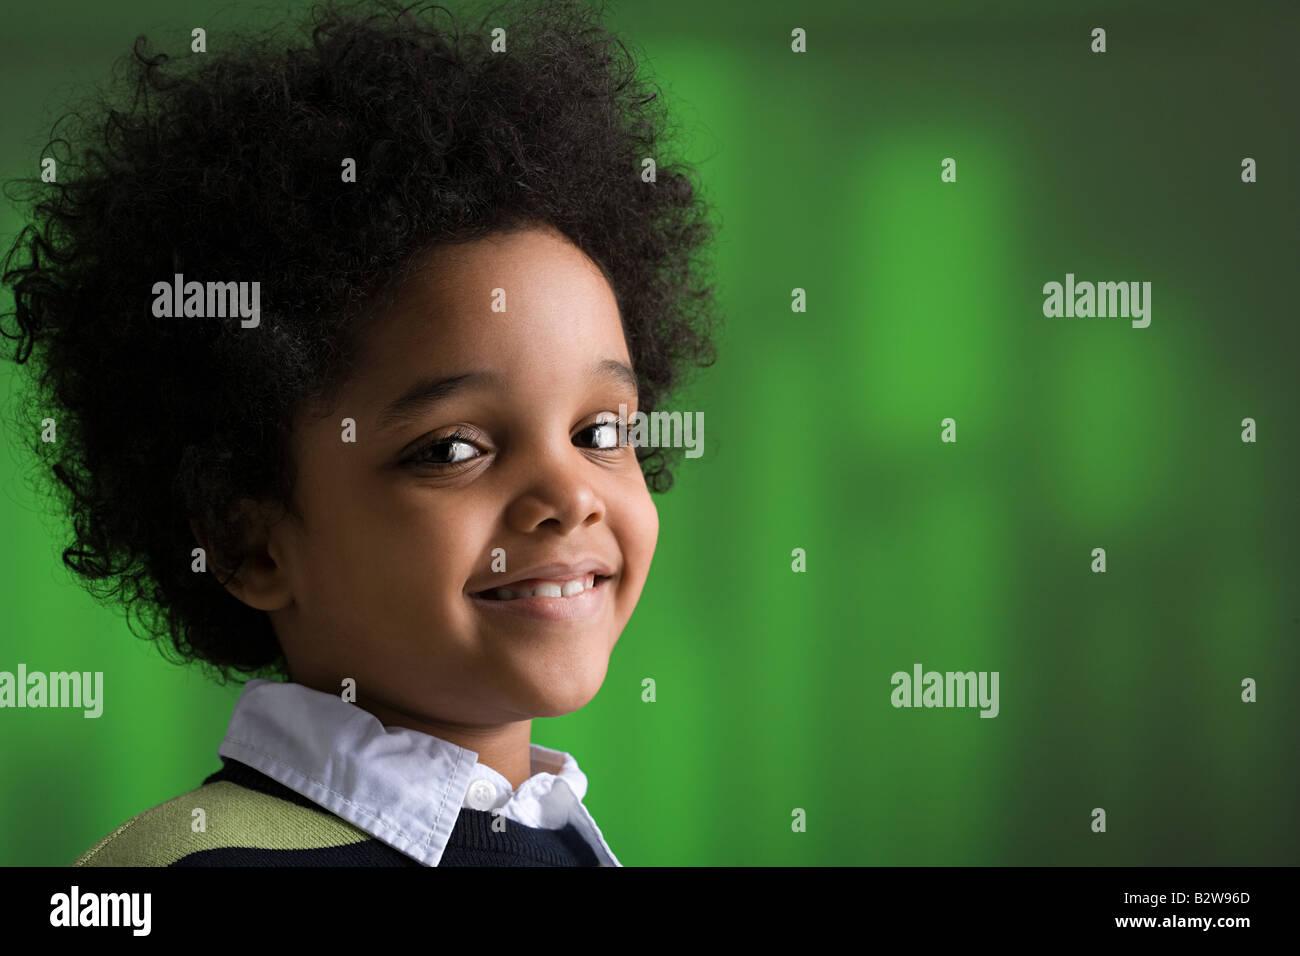 Portrait of a boy - Stock Image